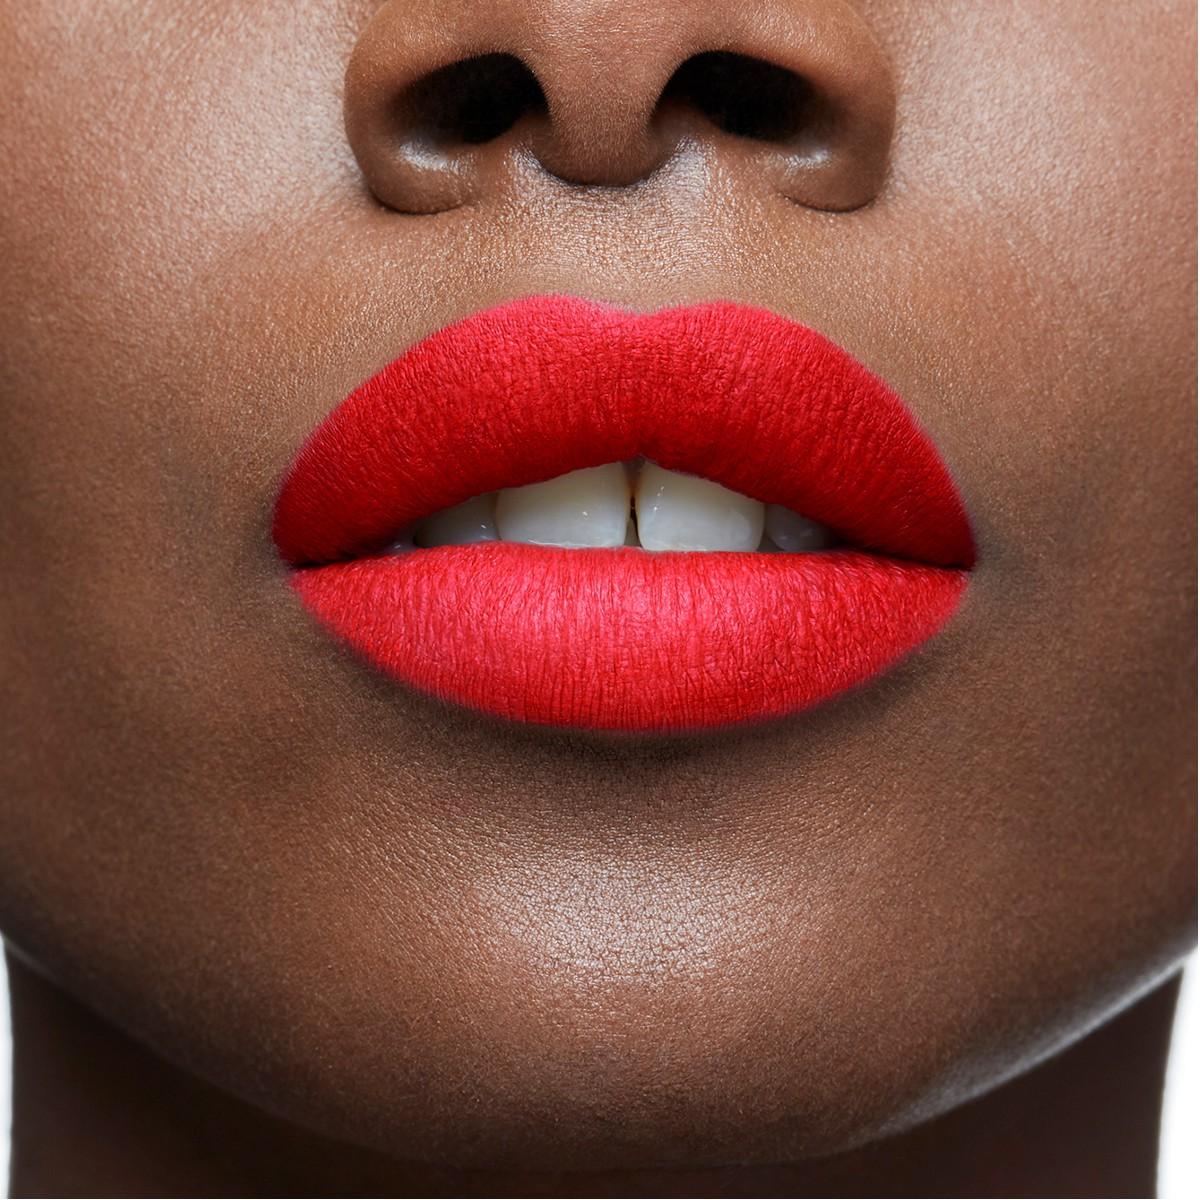 Woman Beauty - マットフルイド リップカラー ジャメアセ 004f - Christian Louboutin